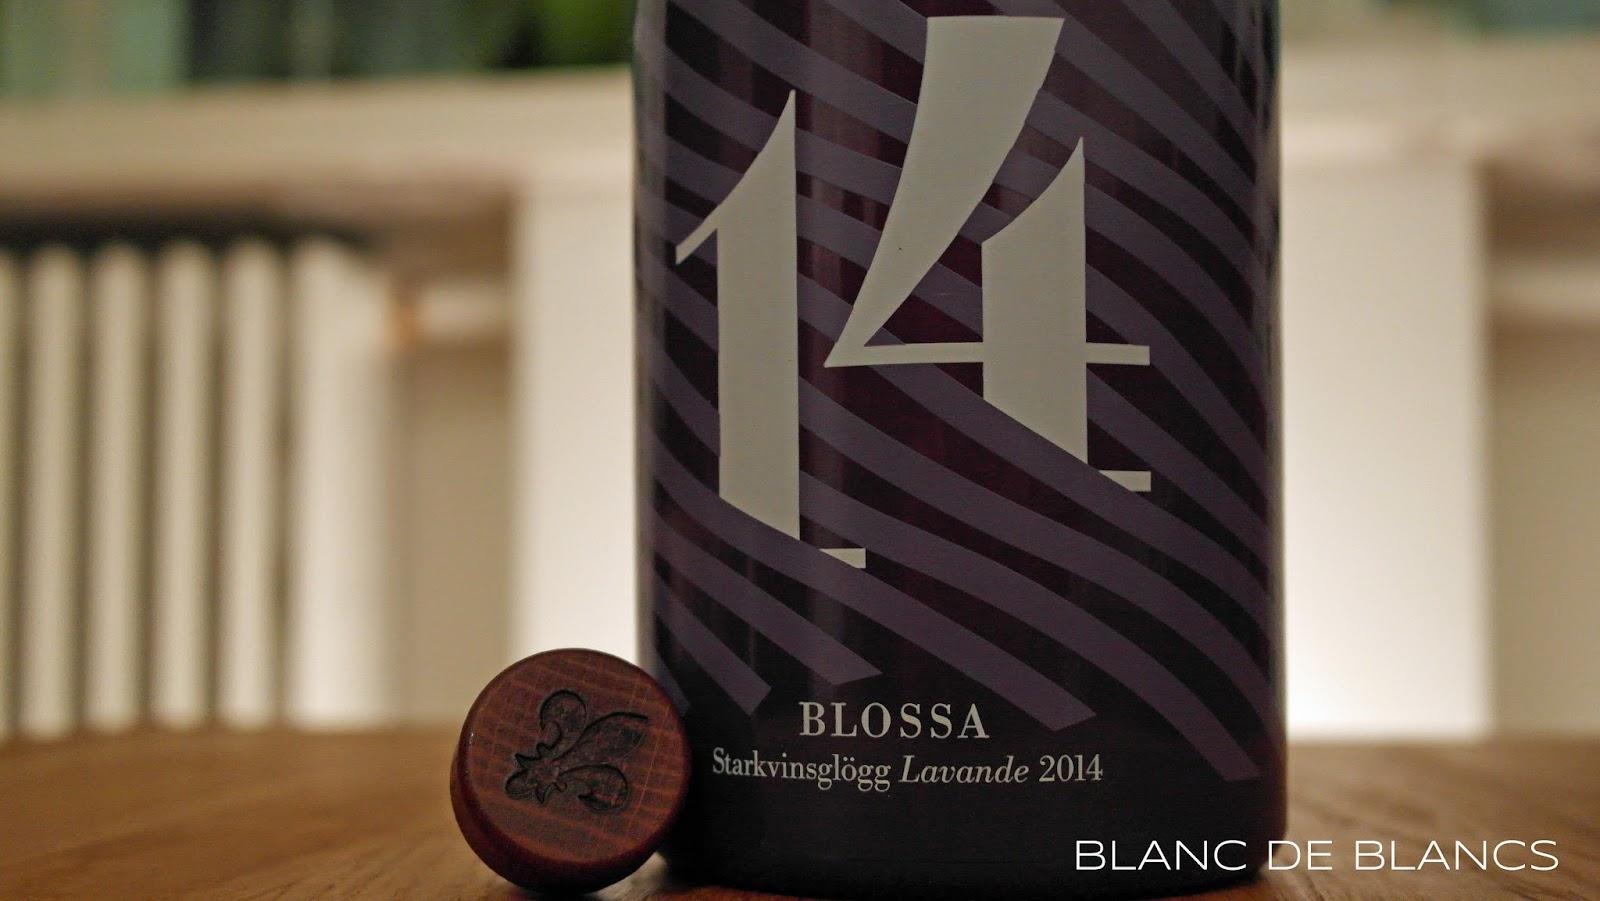 Blossa 14 Lavande - www.blancdeblancs.fi